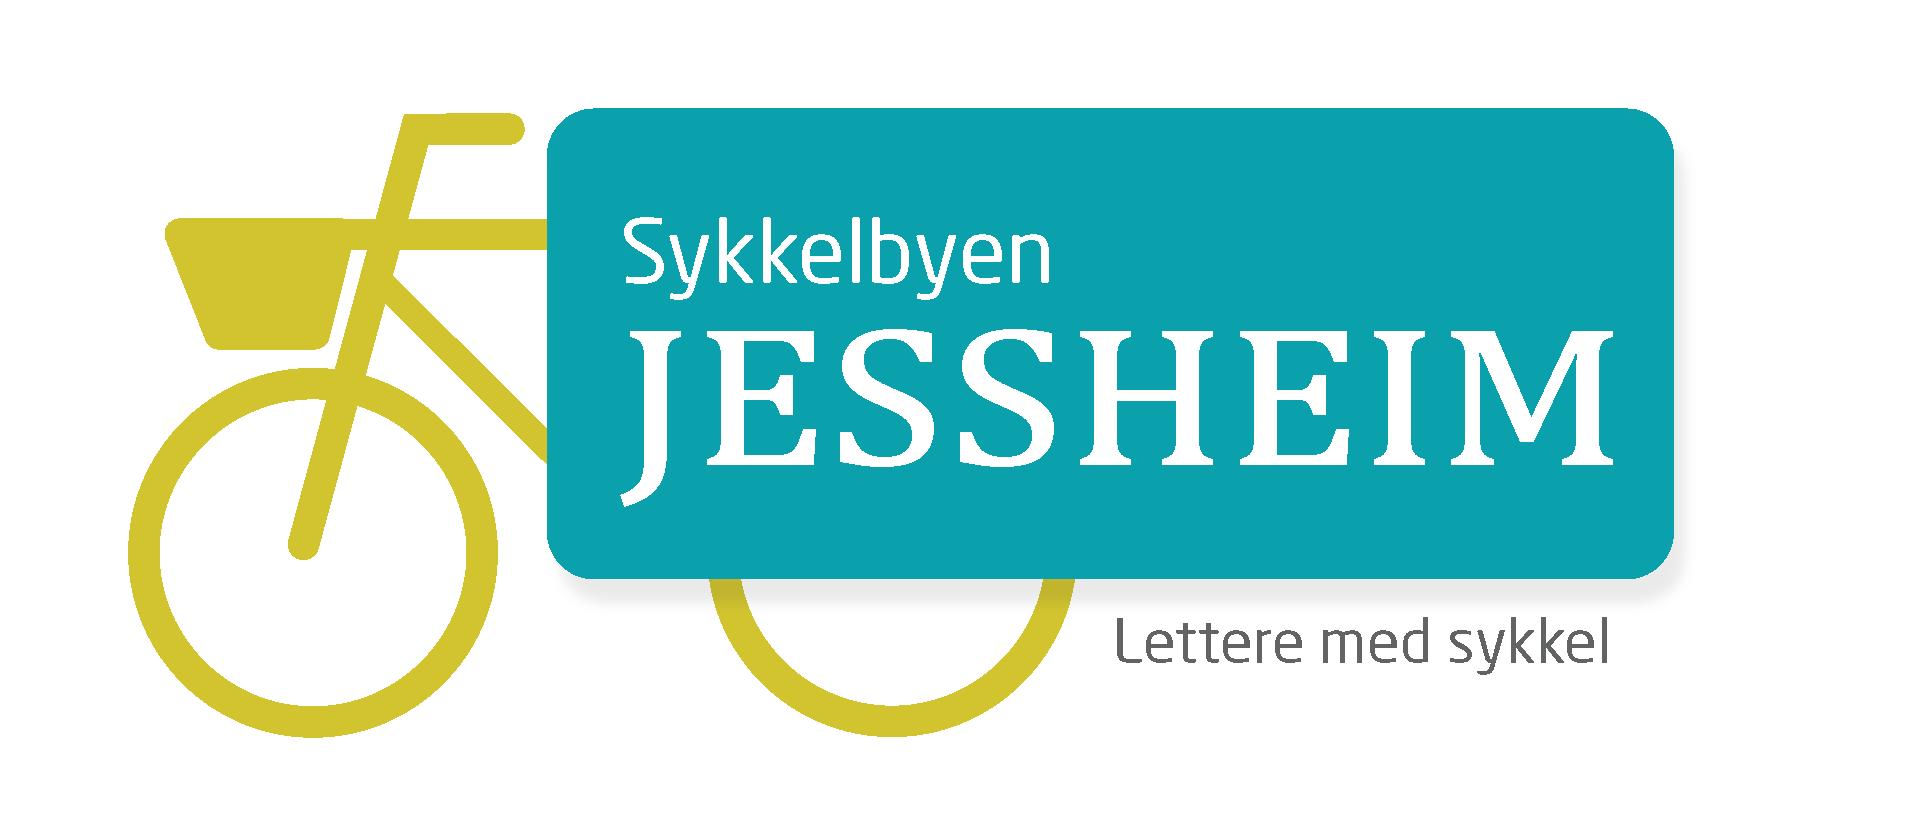 Sykkelbyen Jessheim logo